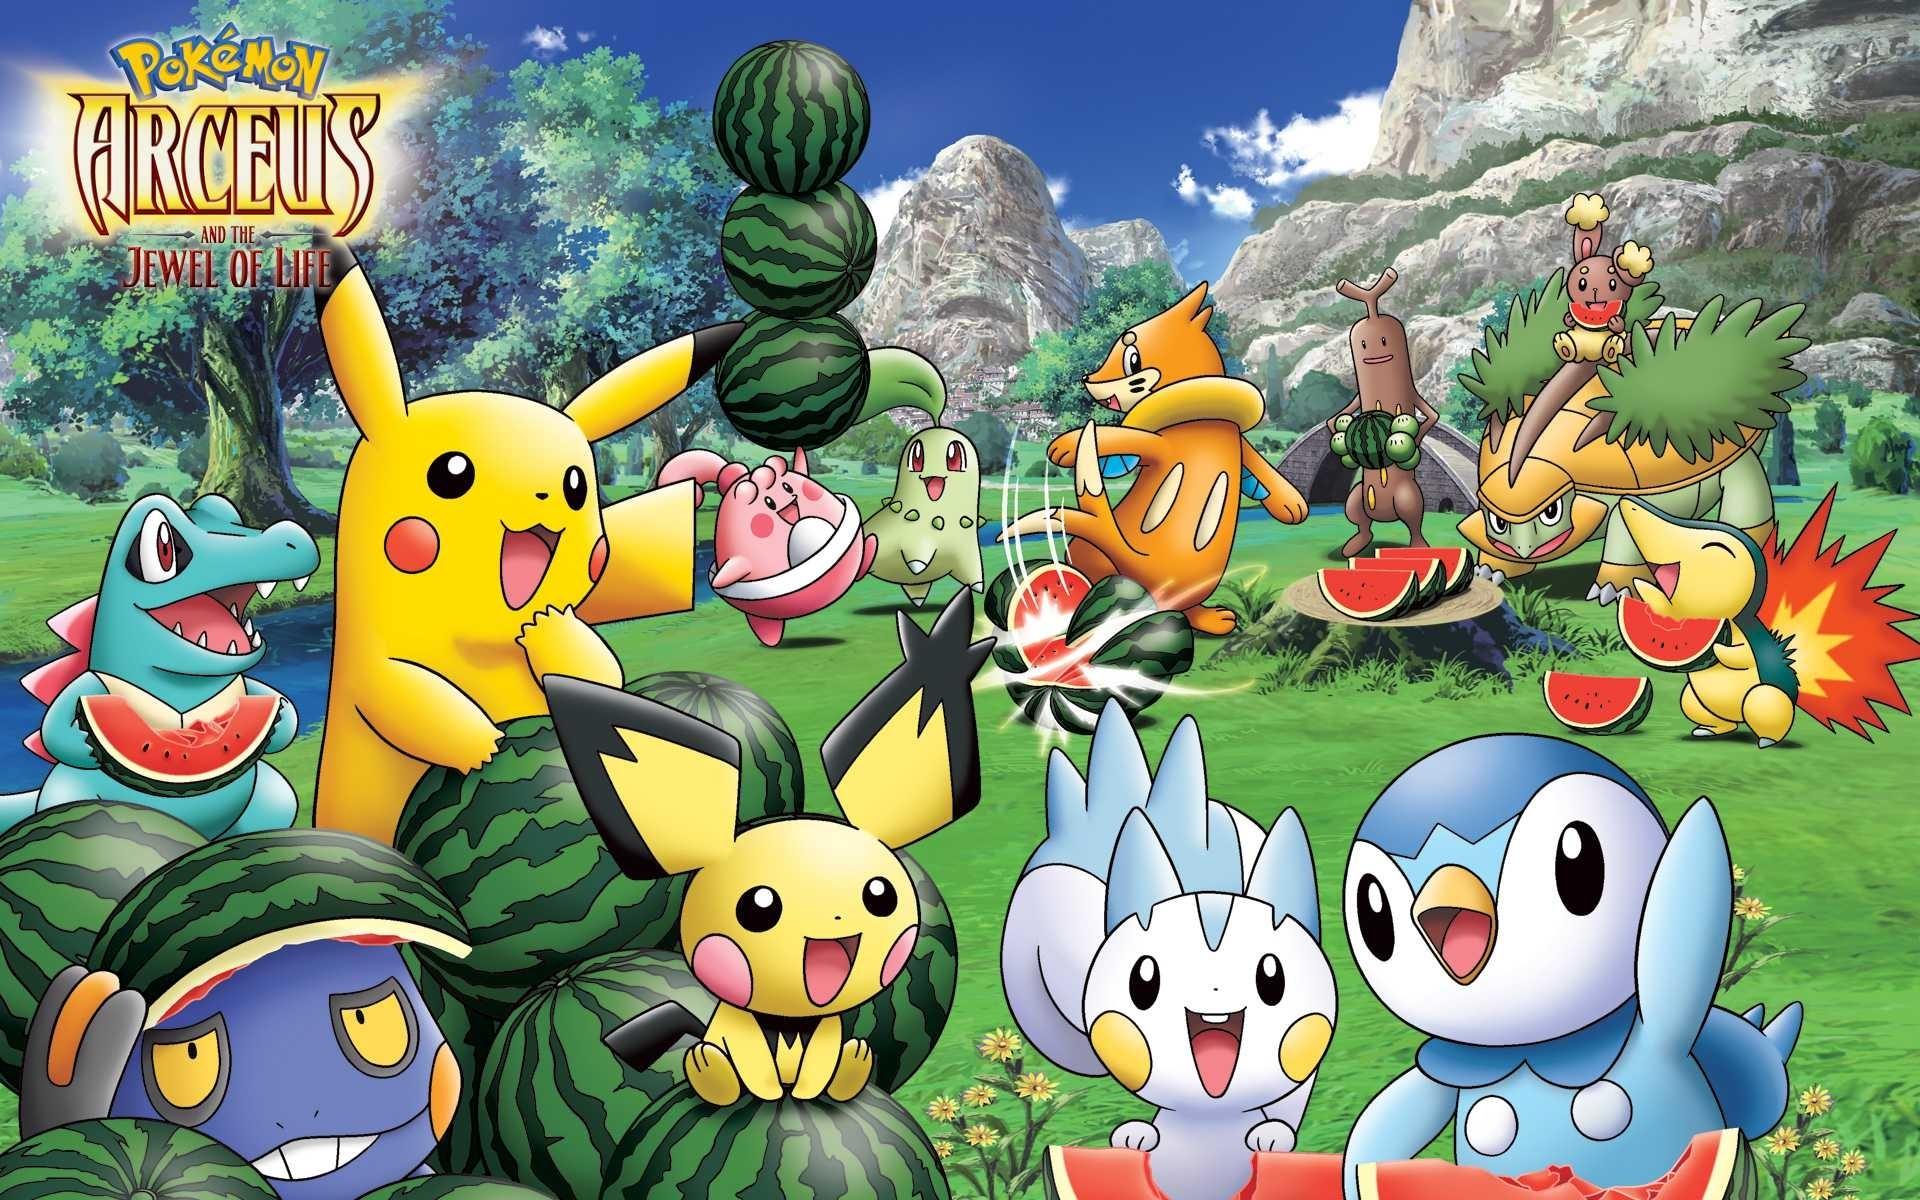 pokemon wallpaper hd for desktop images | wallvie